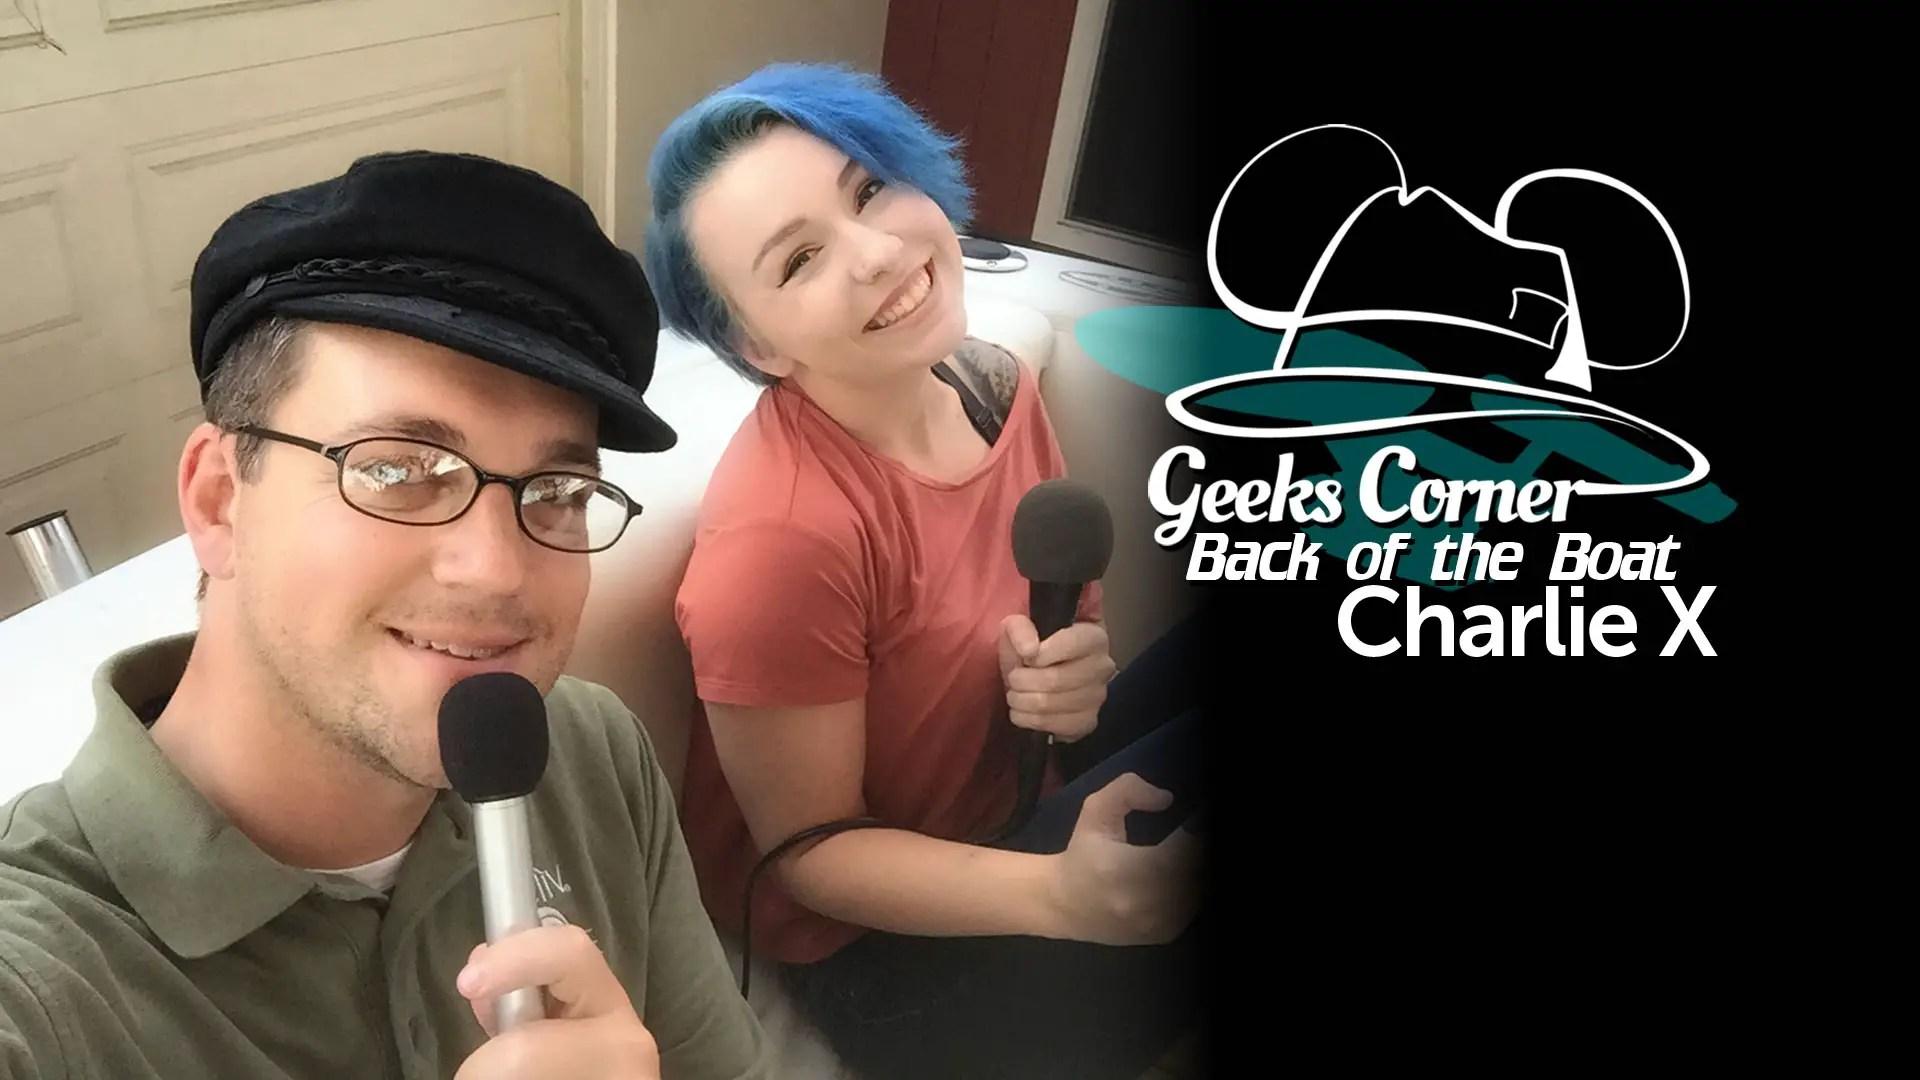 Charlie X - Geeks Corner - Back of the Boat